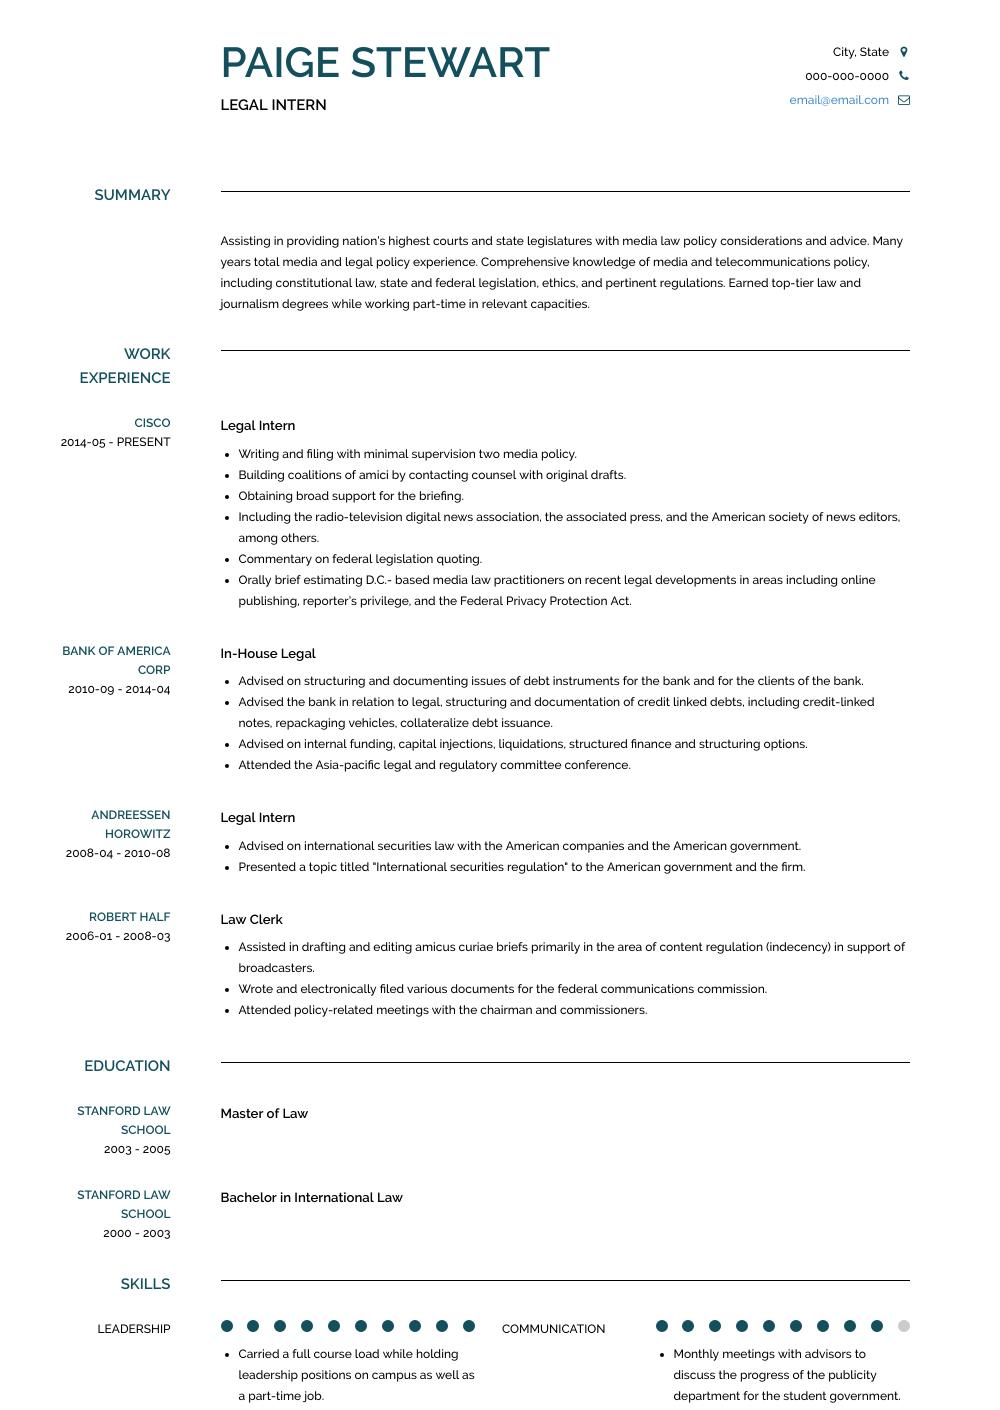 Legal Intern Resume Sample Resume Templates Resume Resume Template Professional